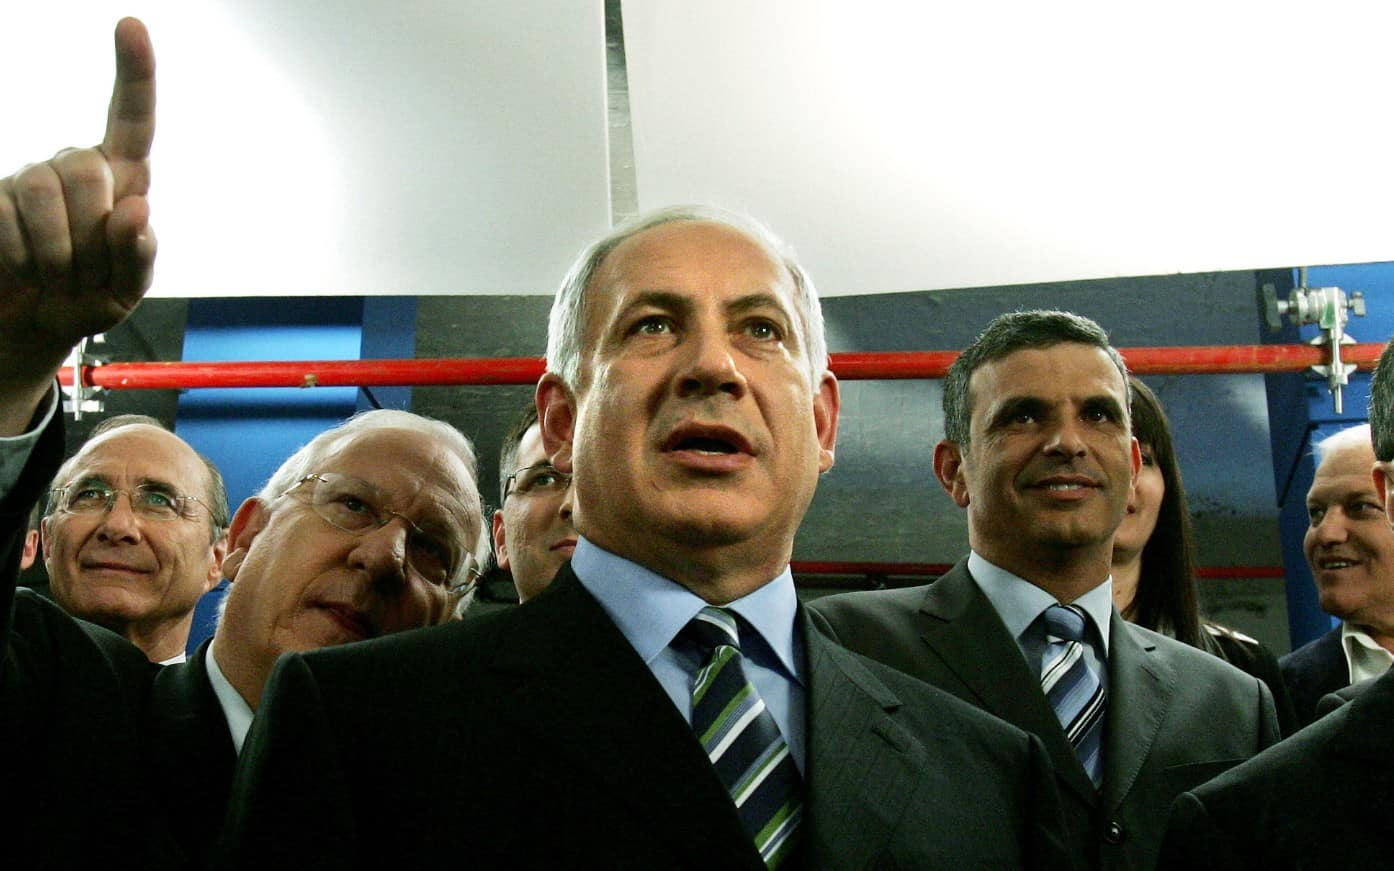 בנימין נתניהו, 2006 (צילום: AP Photo/Ariel Schalit)